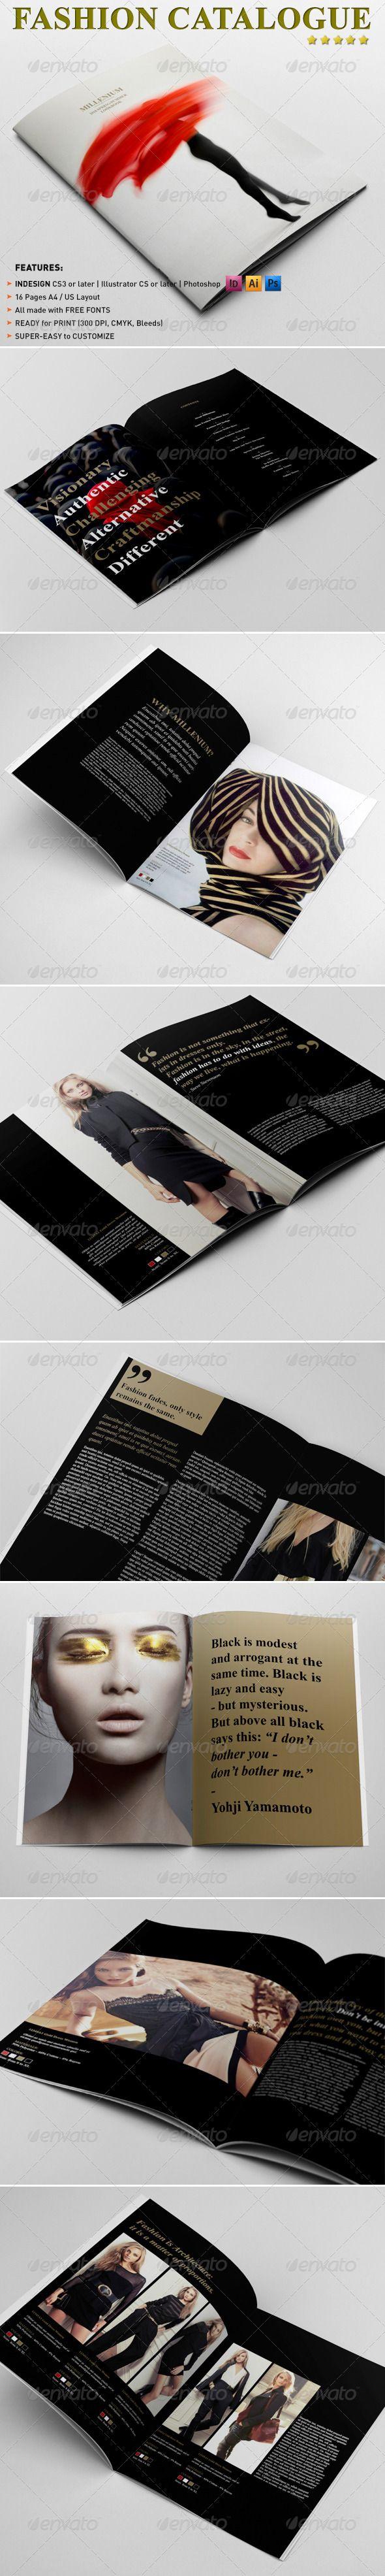 101 best Print Templates images on Pinterest | Print templates ...